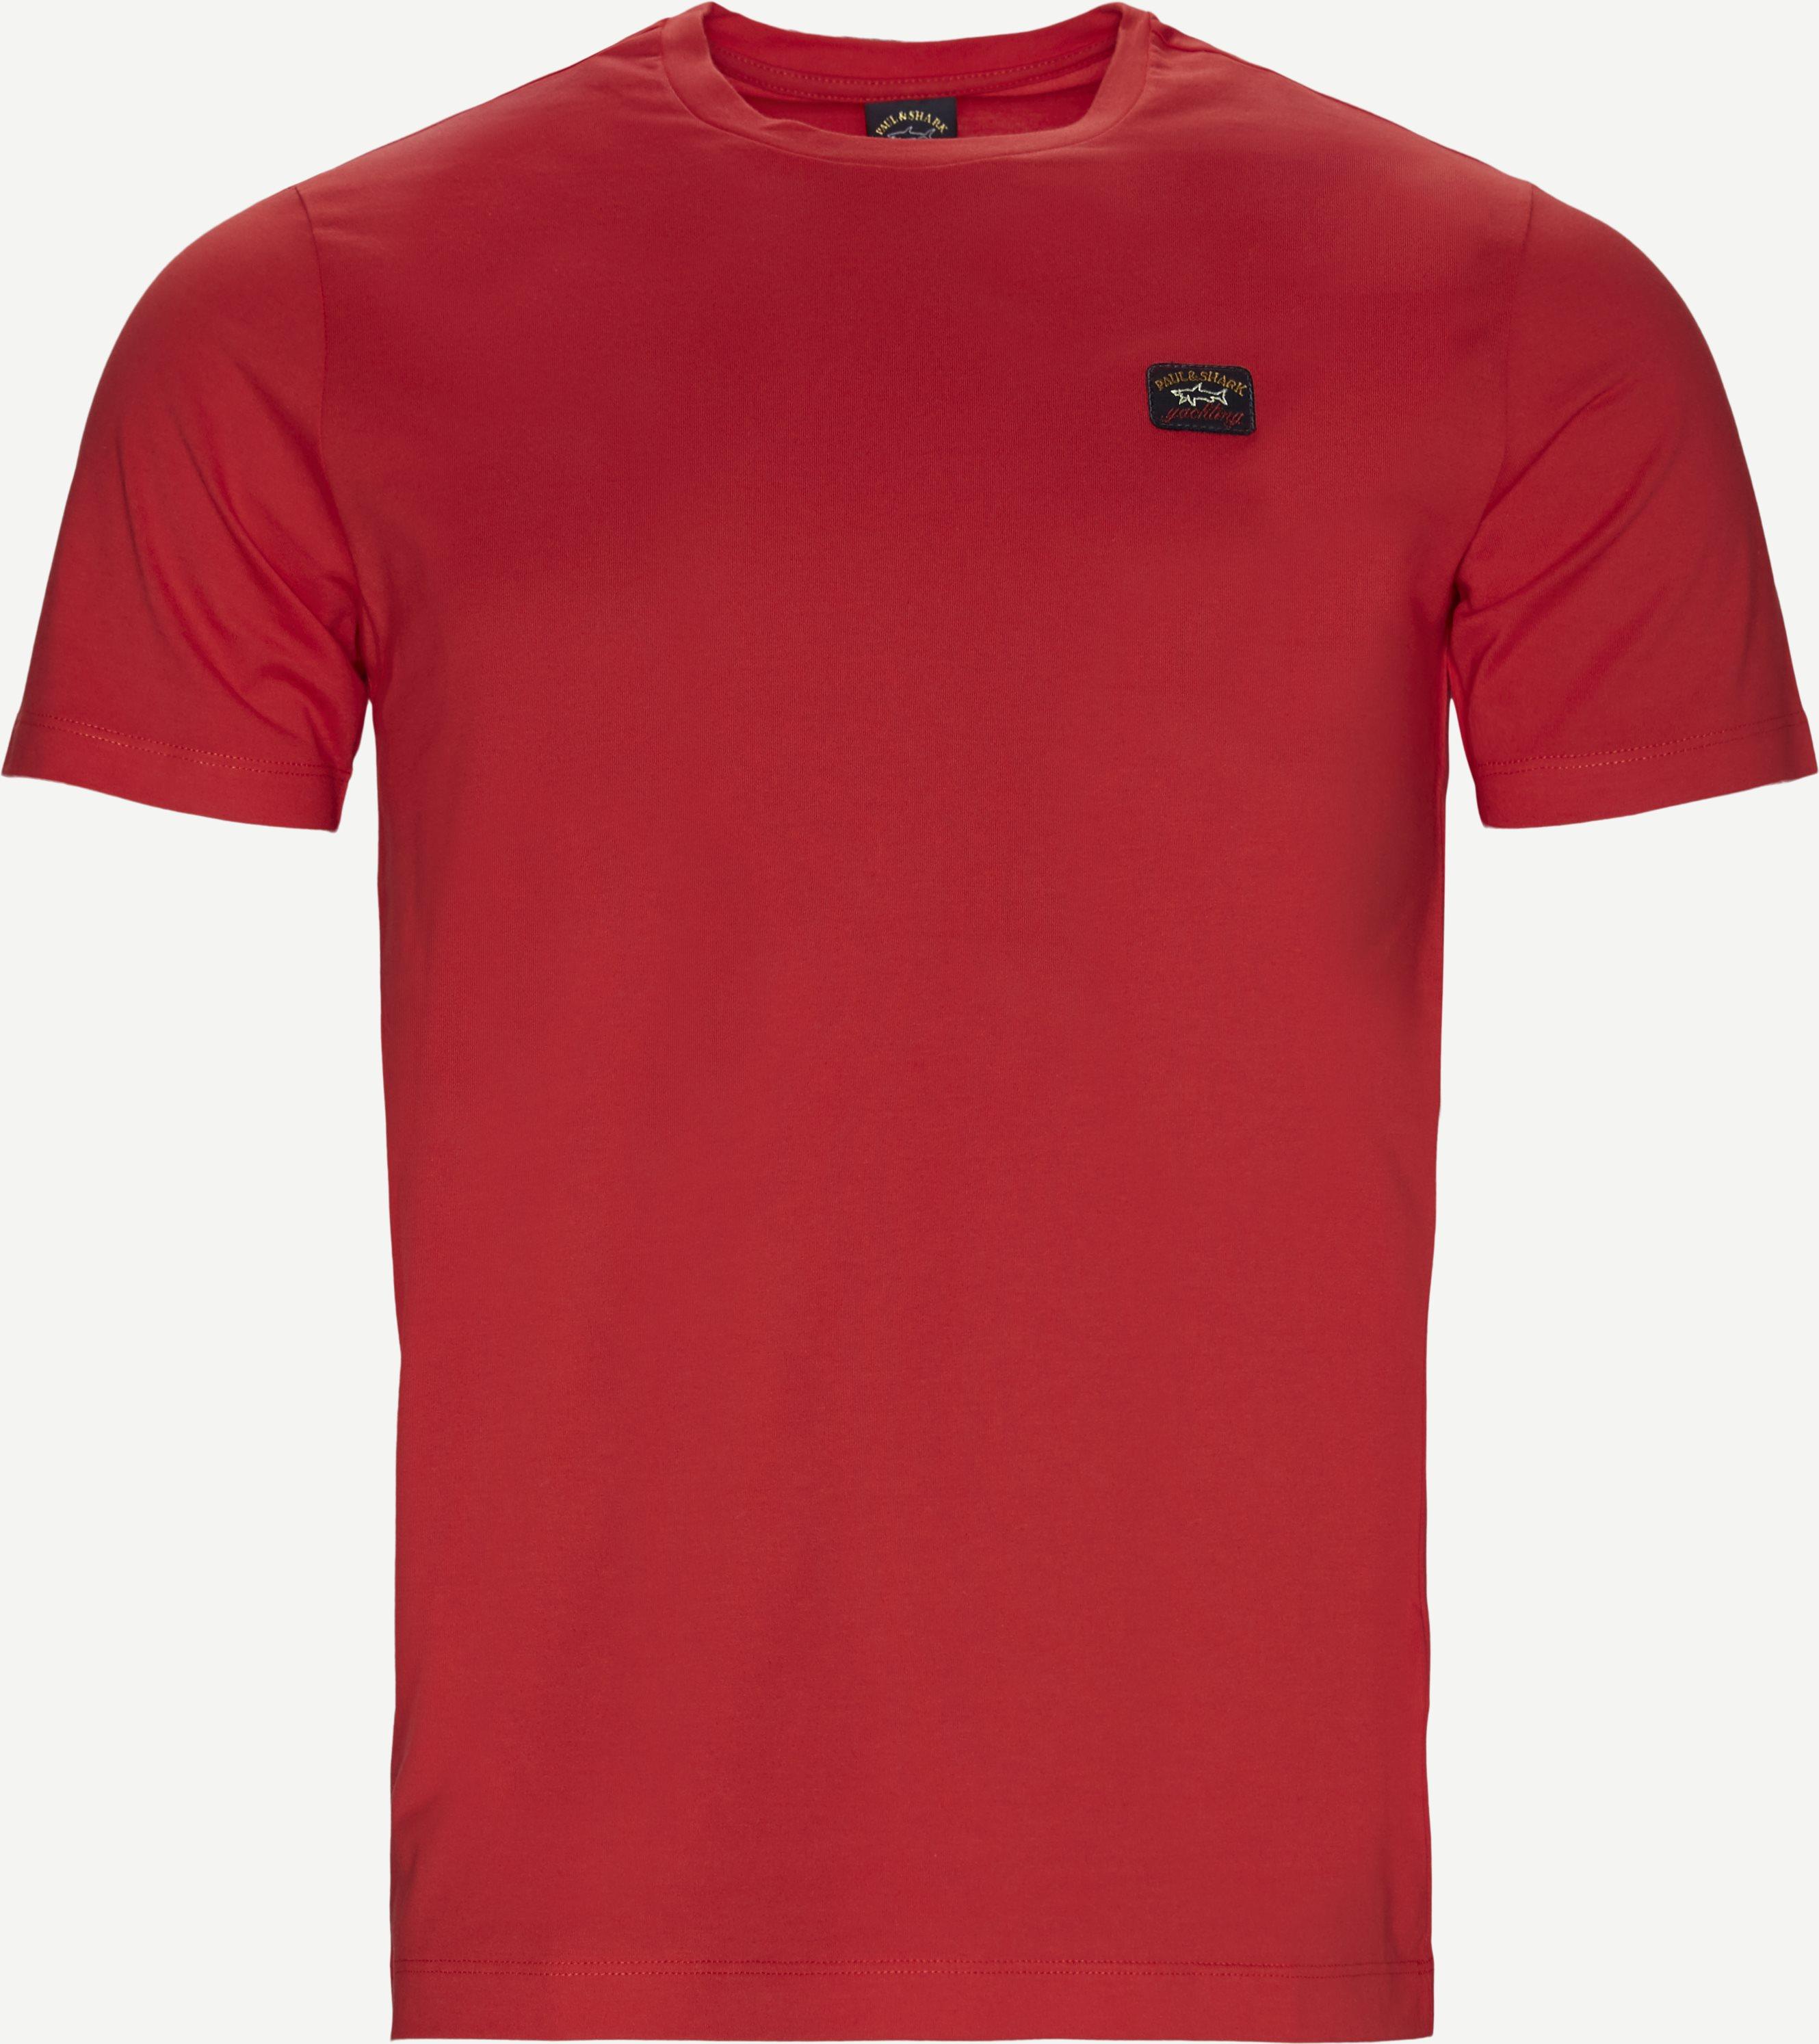 Cop T-shirt - T-shirts - Regular fit - Rød